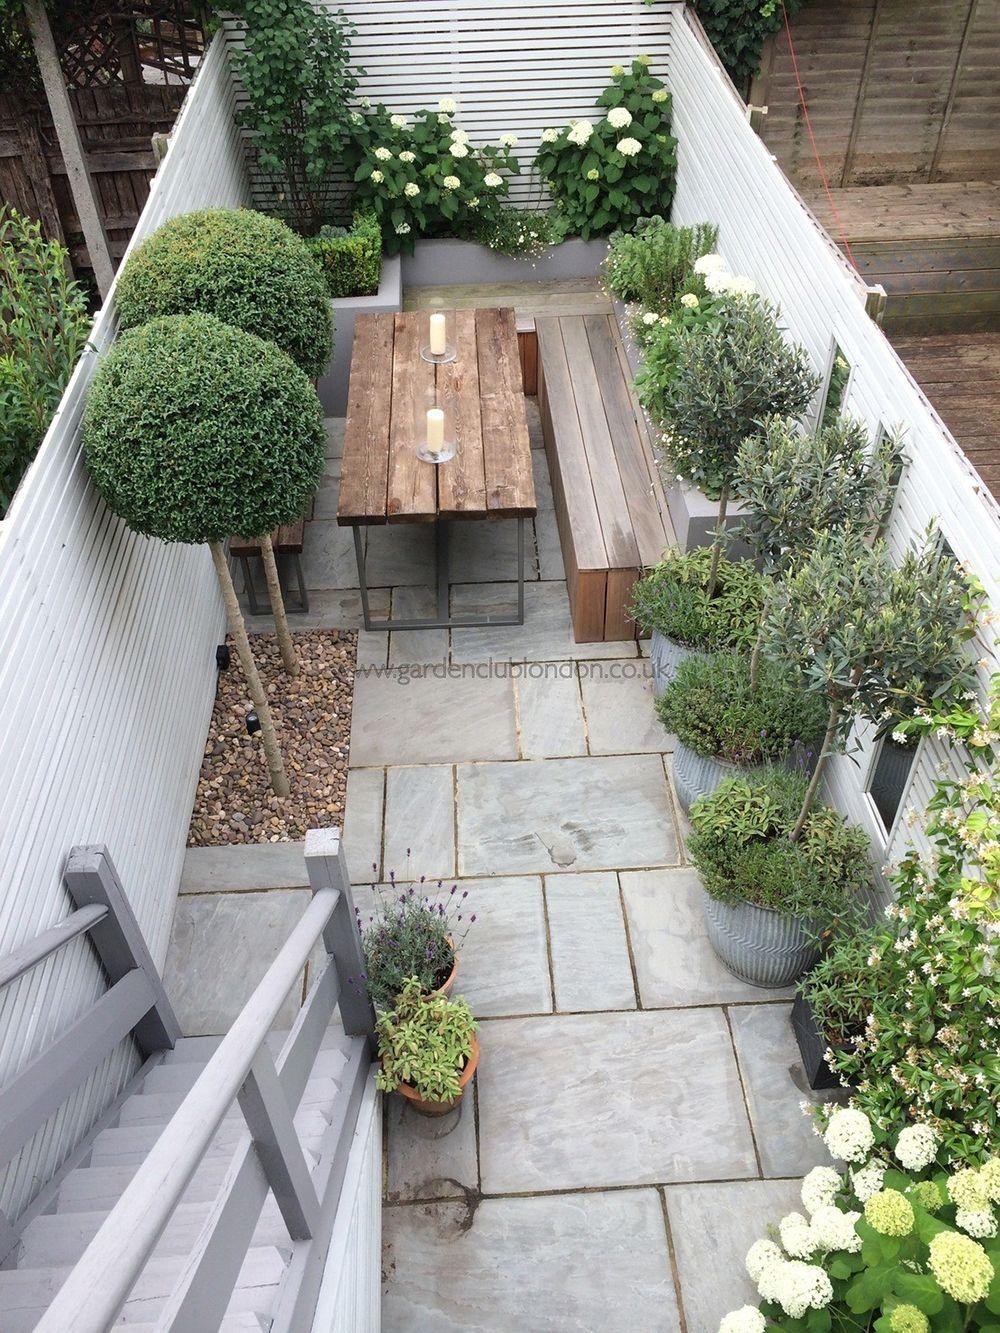 Kleiner Garten - Terrasse | Green Living | Pinterest | Gärten ... Garten Gestaltung Fruhling Sommer